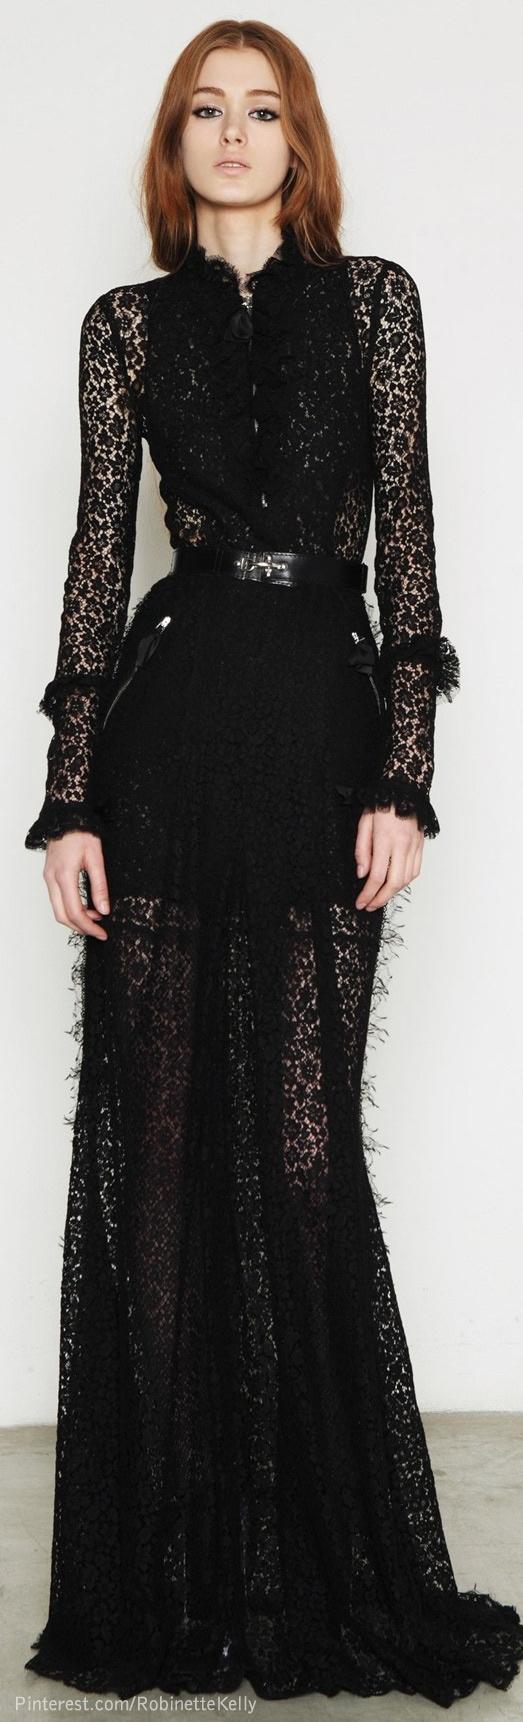 best black dresses images on pinterest boho fashion dark